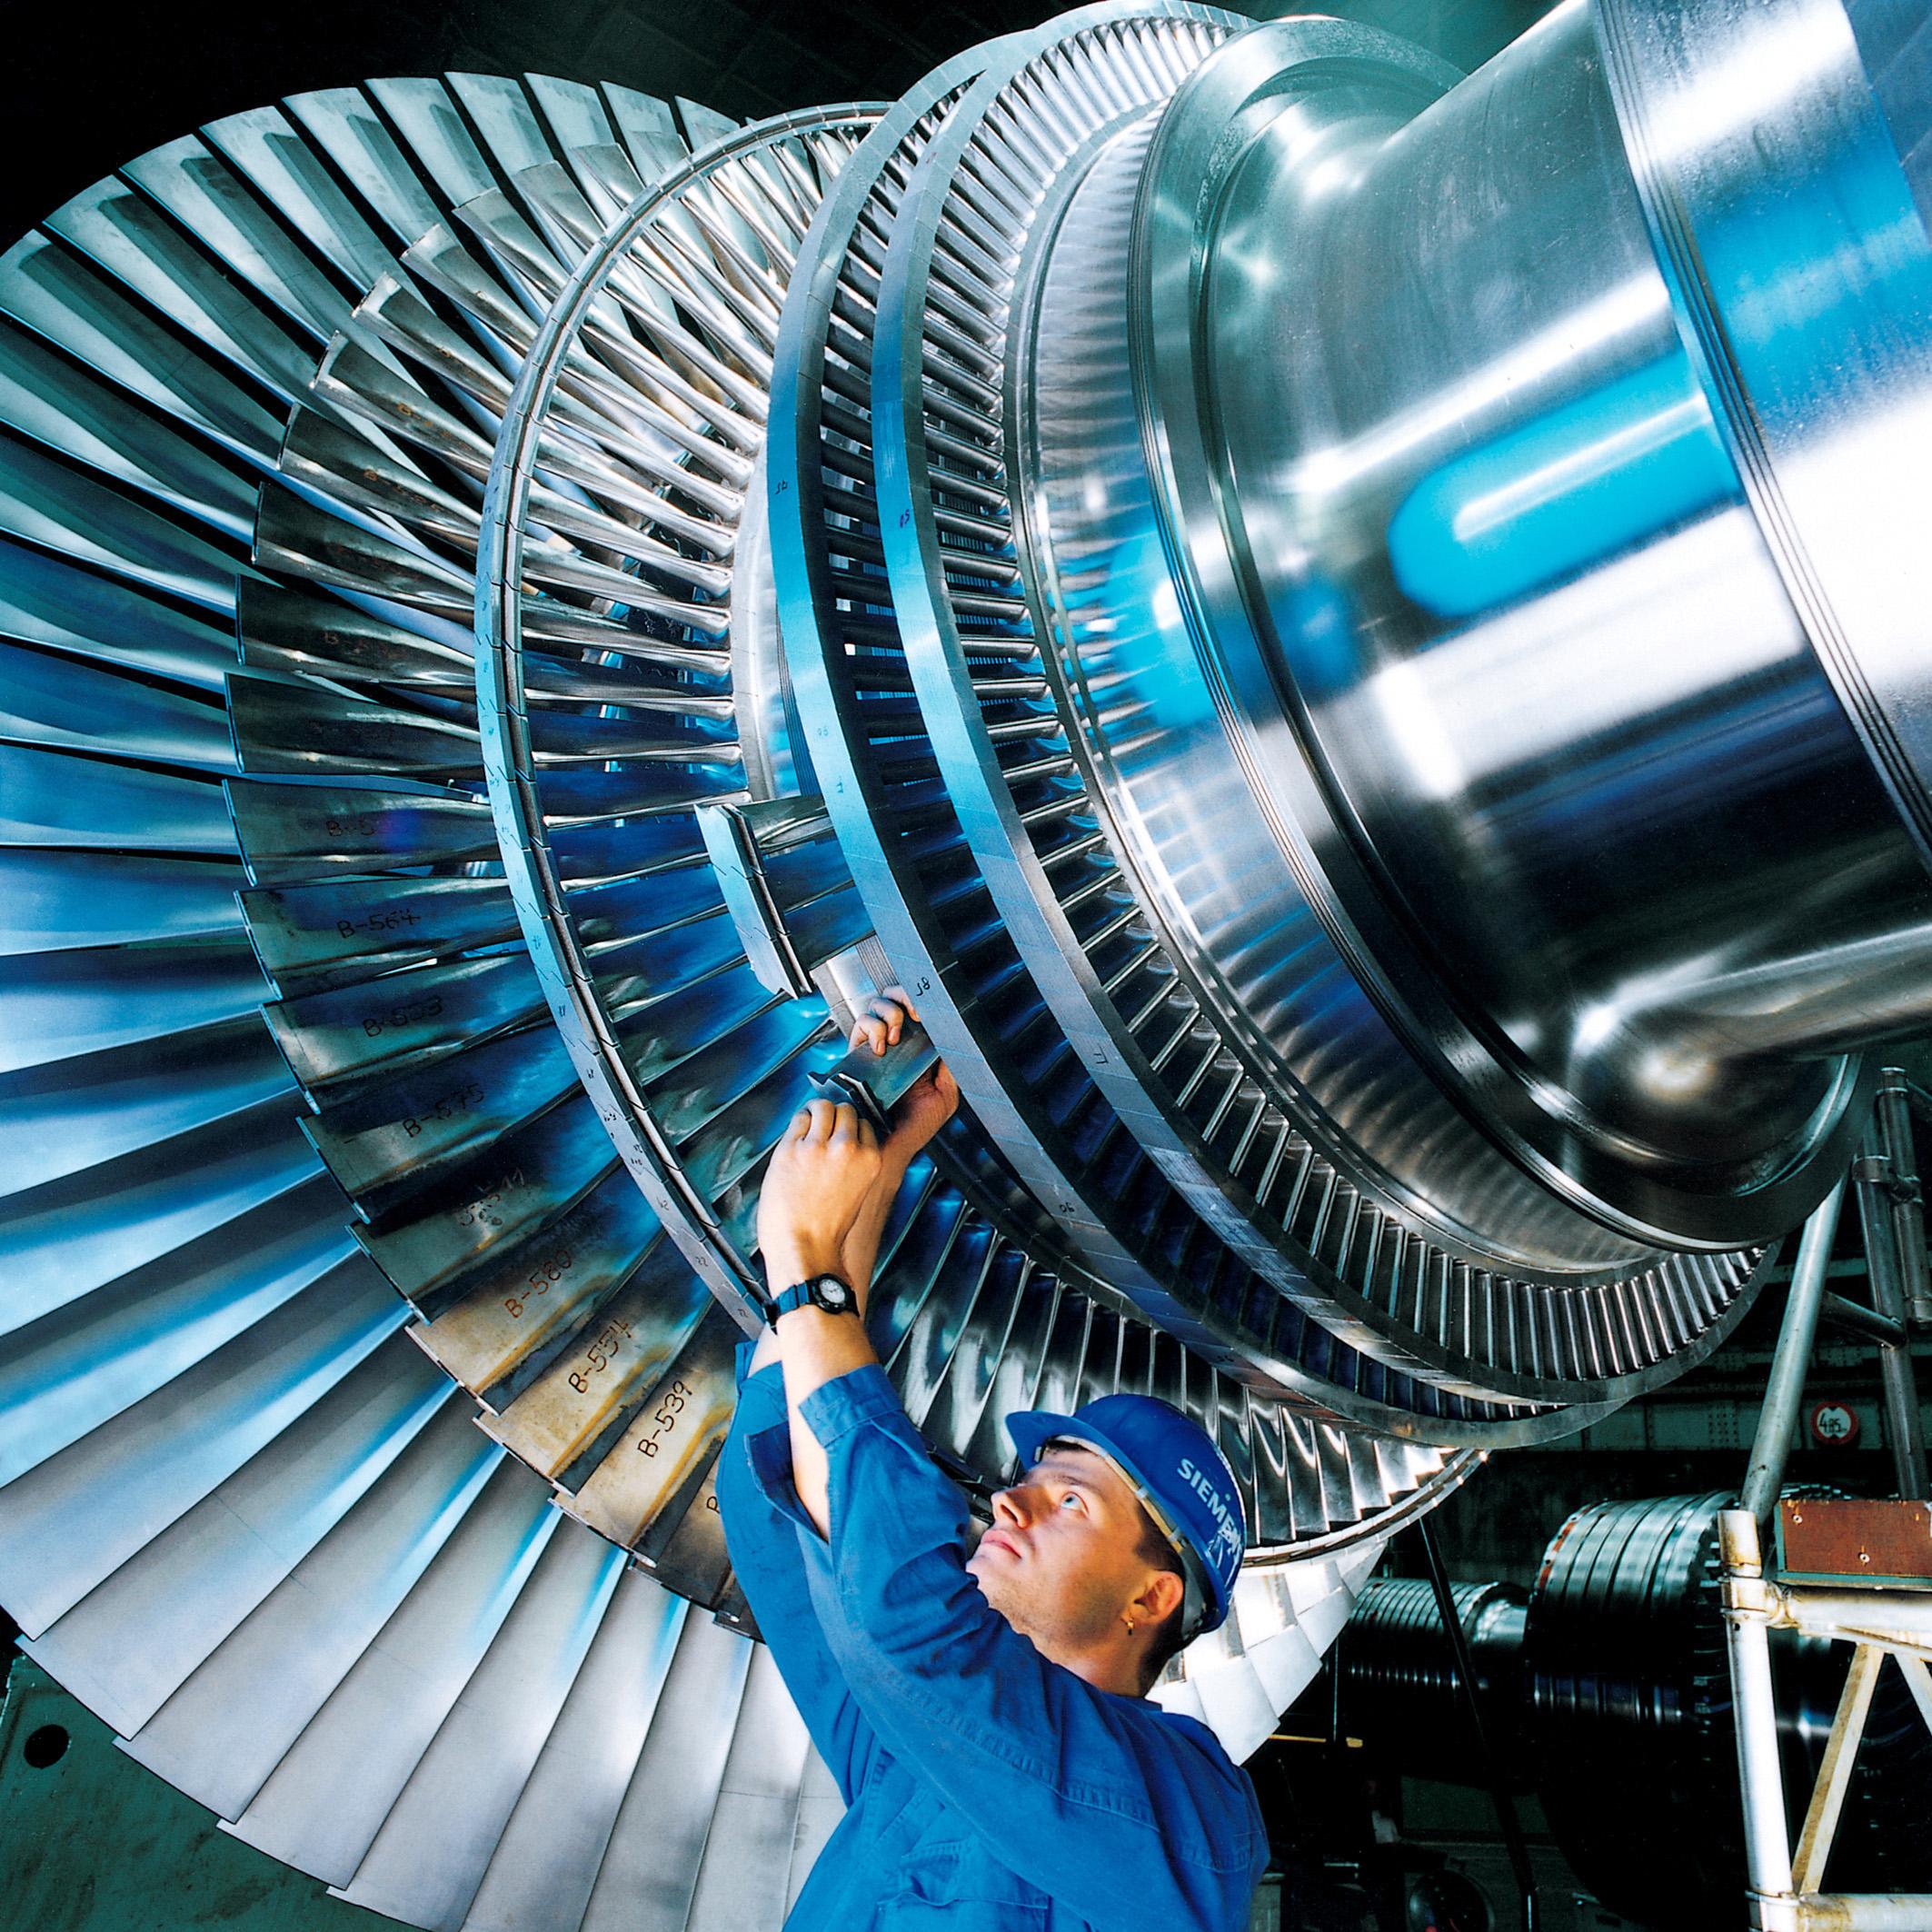 Pelton Turbine selection - Physics Help and Math Help - Physics Forums